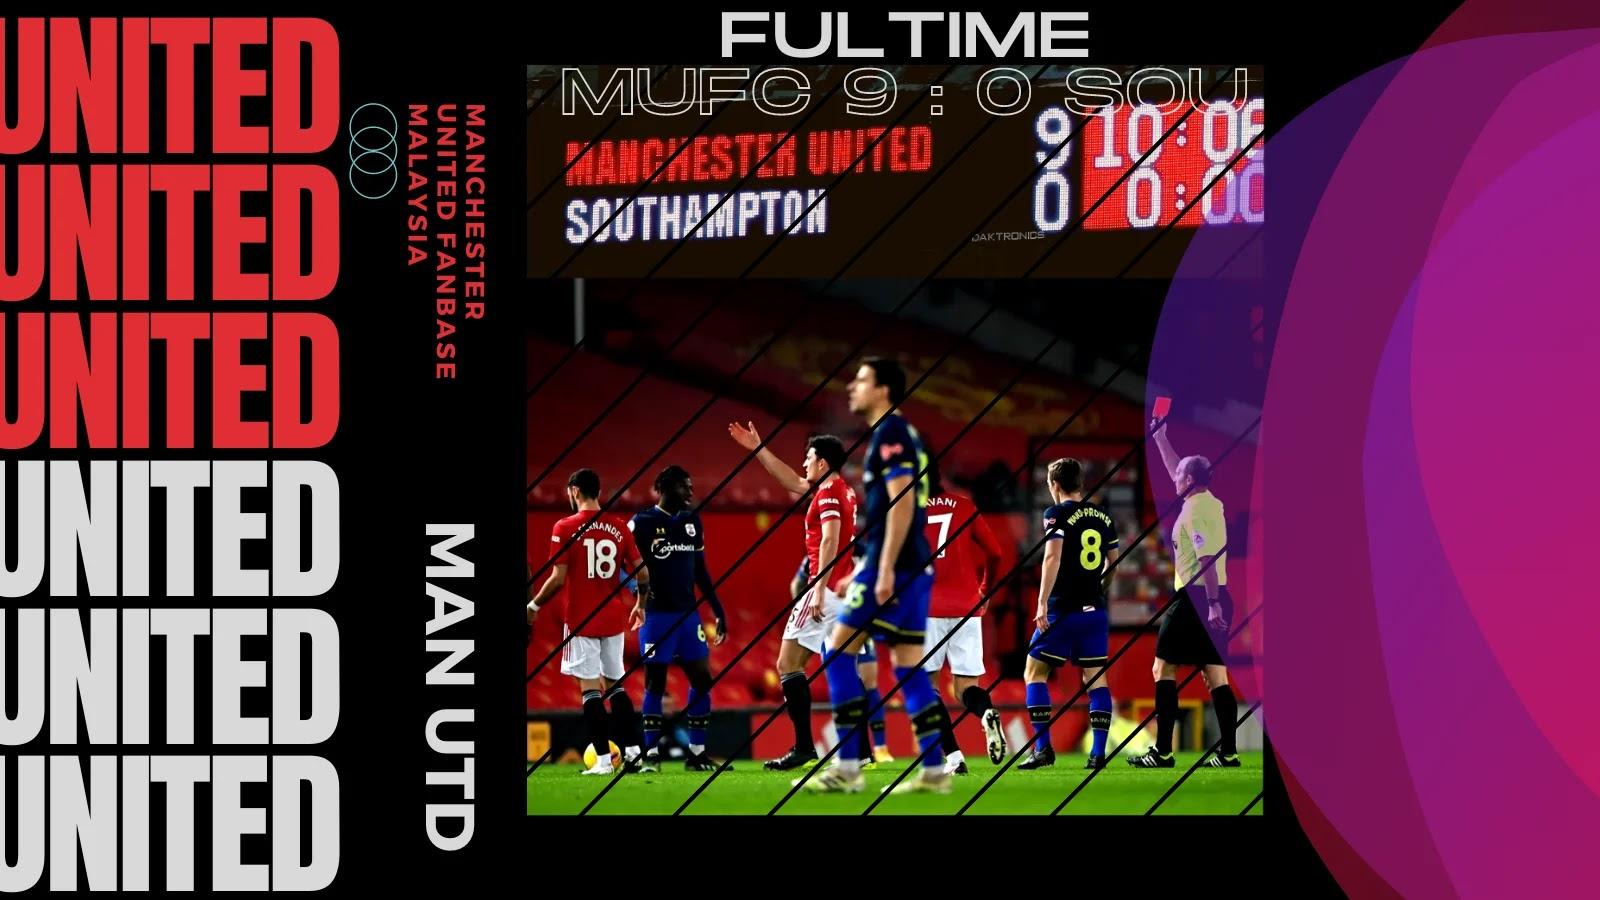 Kemenangan Man Utd 9-0 Lawan Southampton